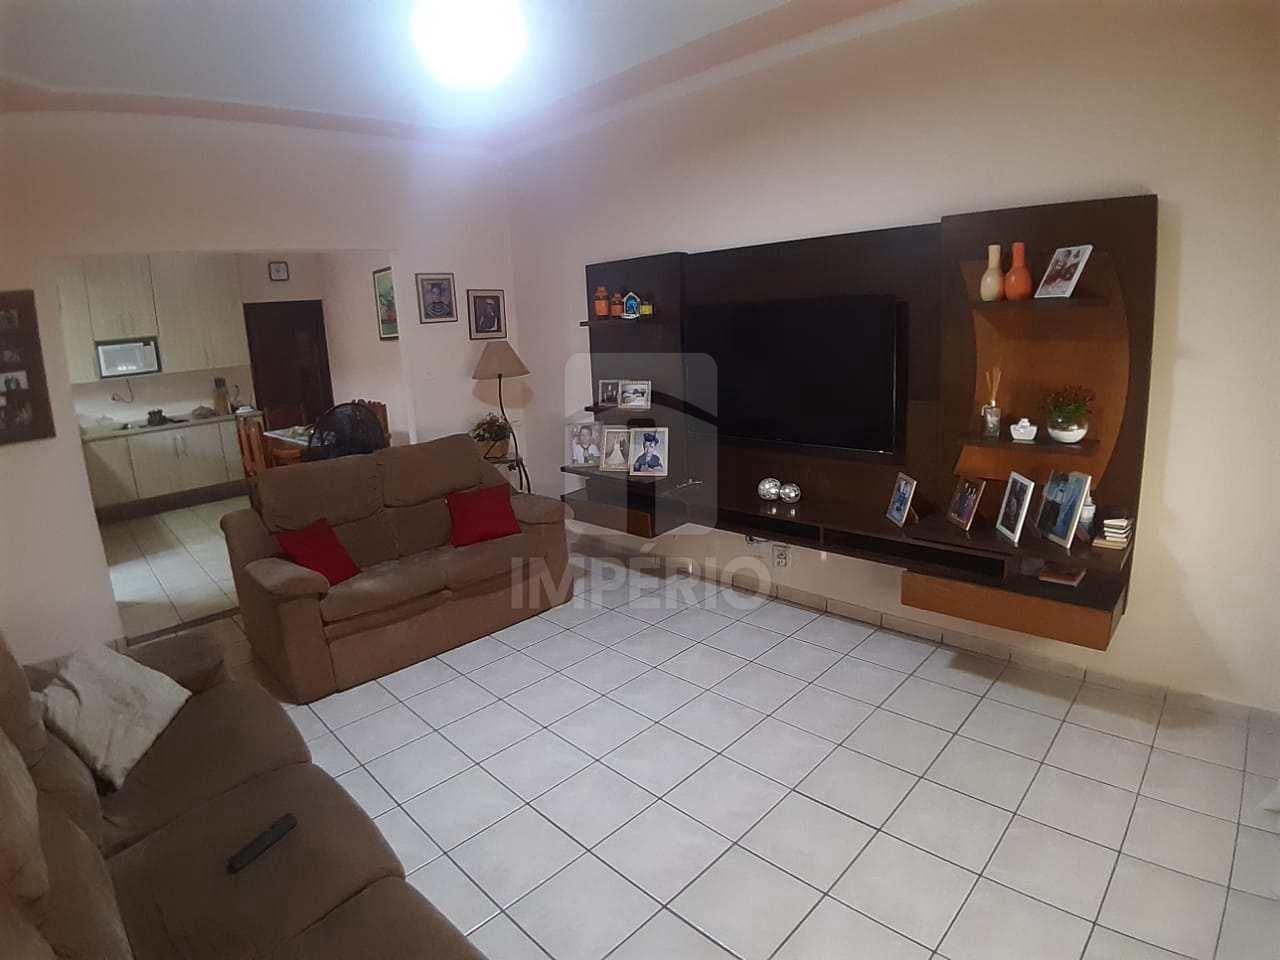 Casa com 2 dorms, Jardim Planalto, Jaú - R$ 250 mil, Cod: 347